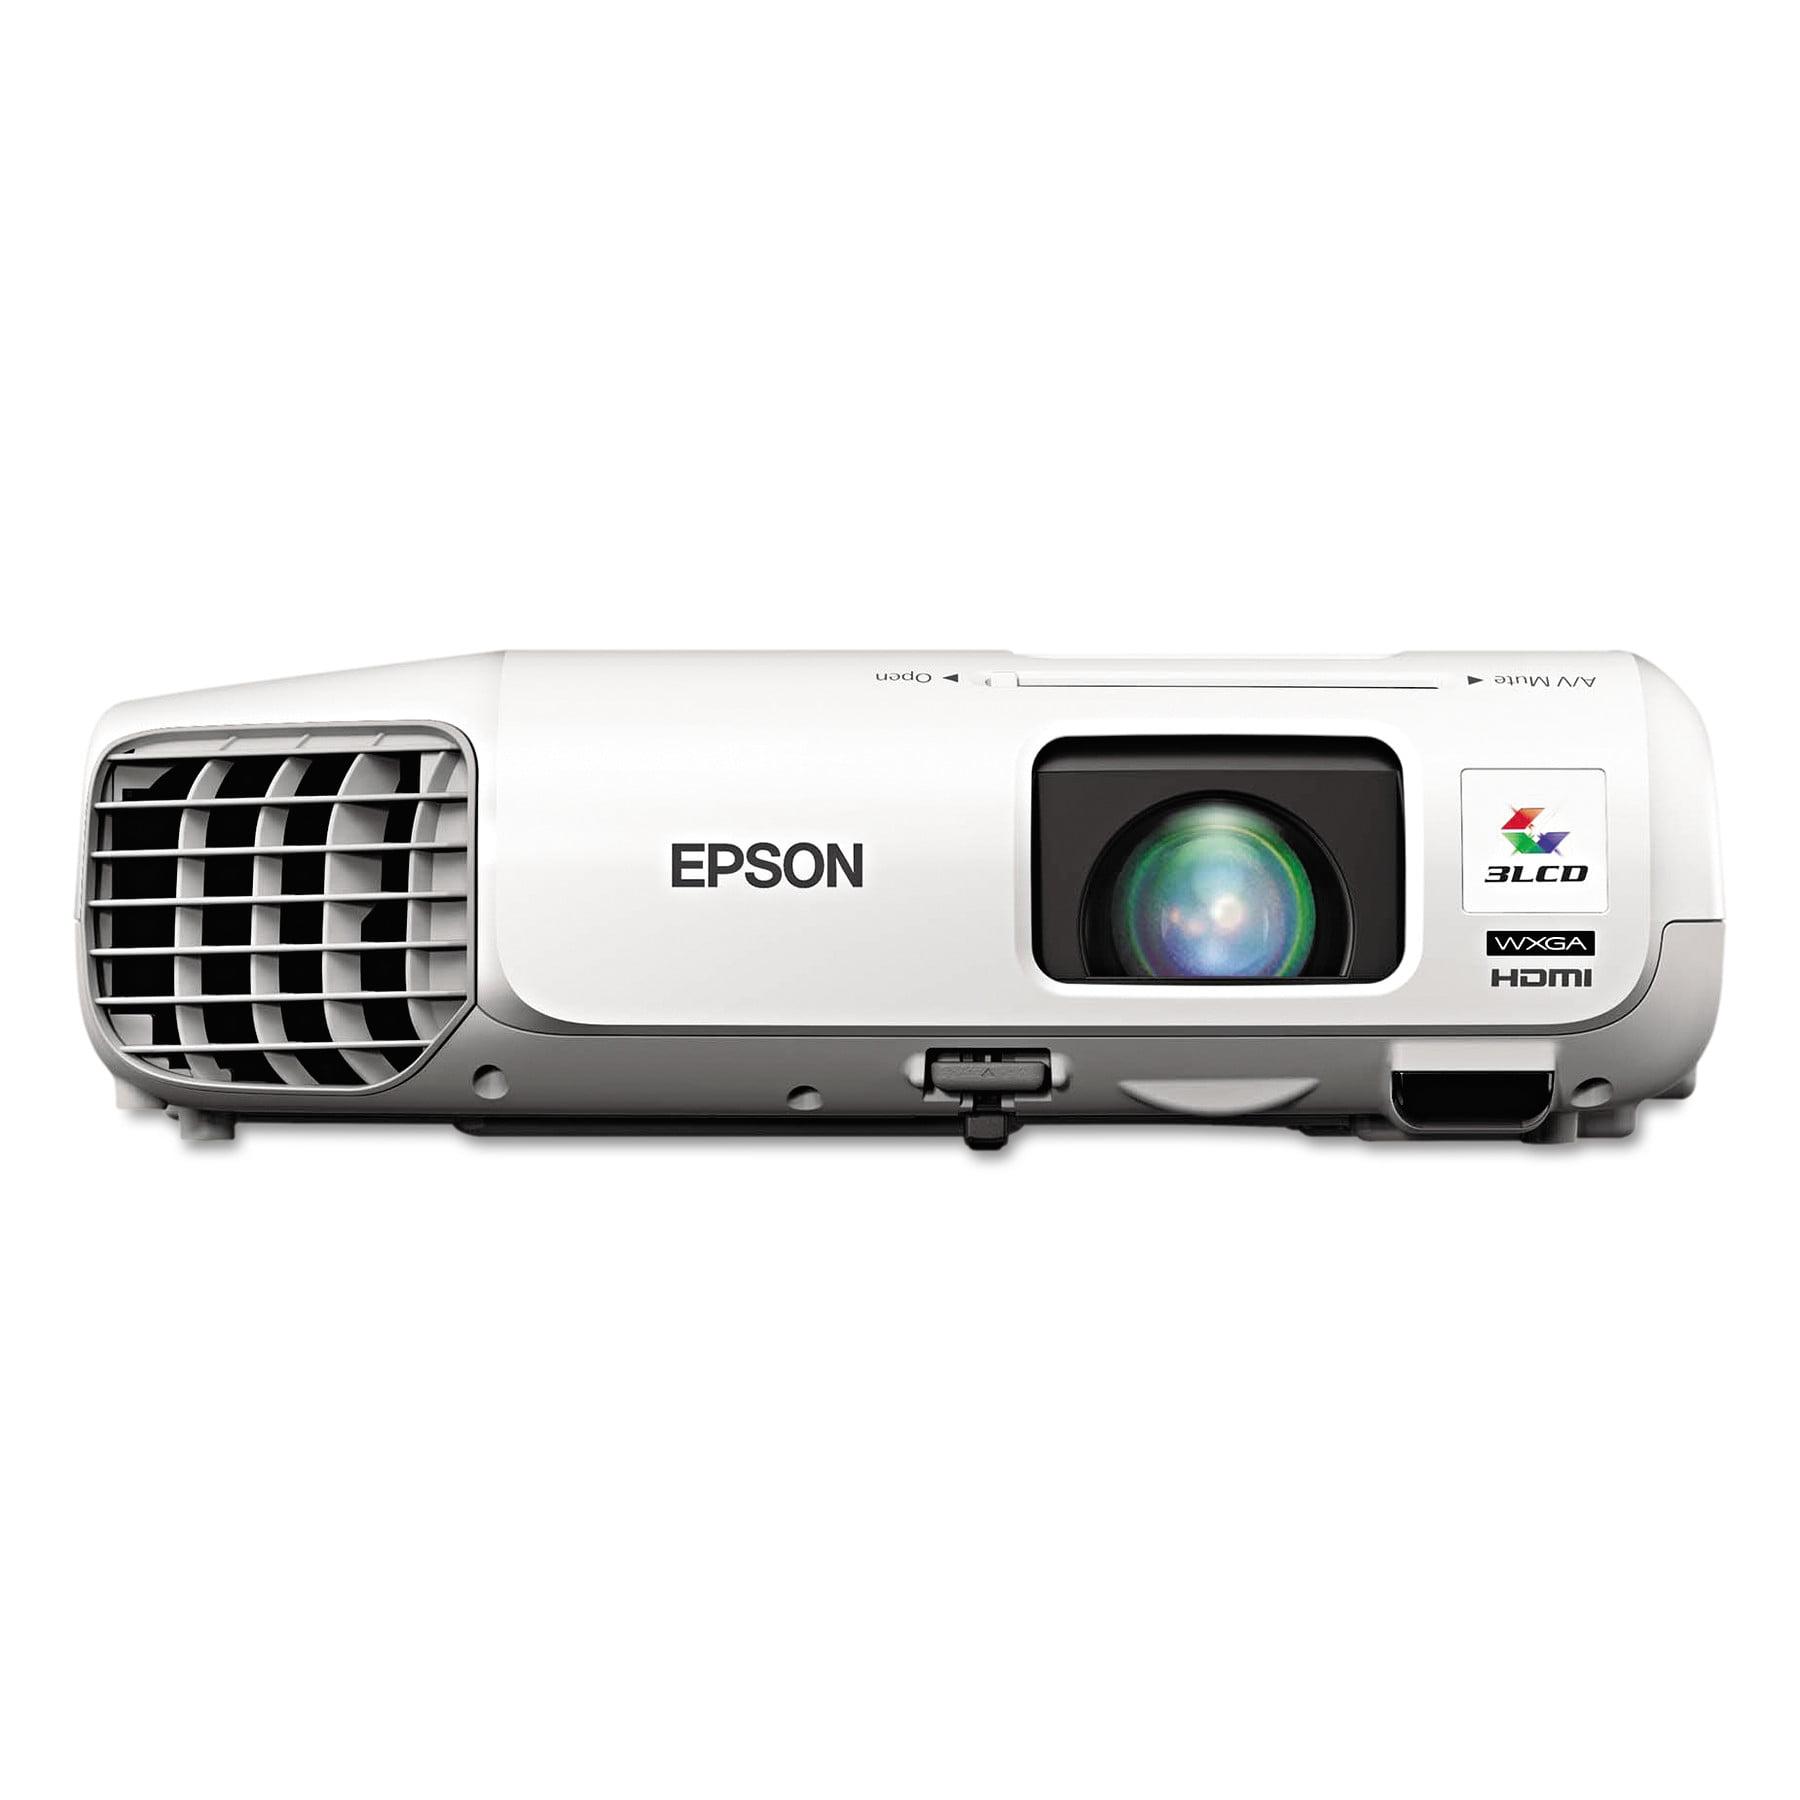 Epson PowerLite 955WH WXGA 3LCD Projector, 3200 Lumens, 1280 x 800 Pixels, 1.6x Zoom by Epson